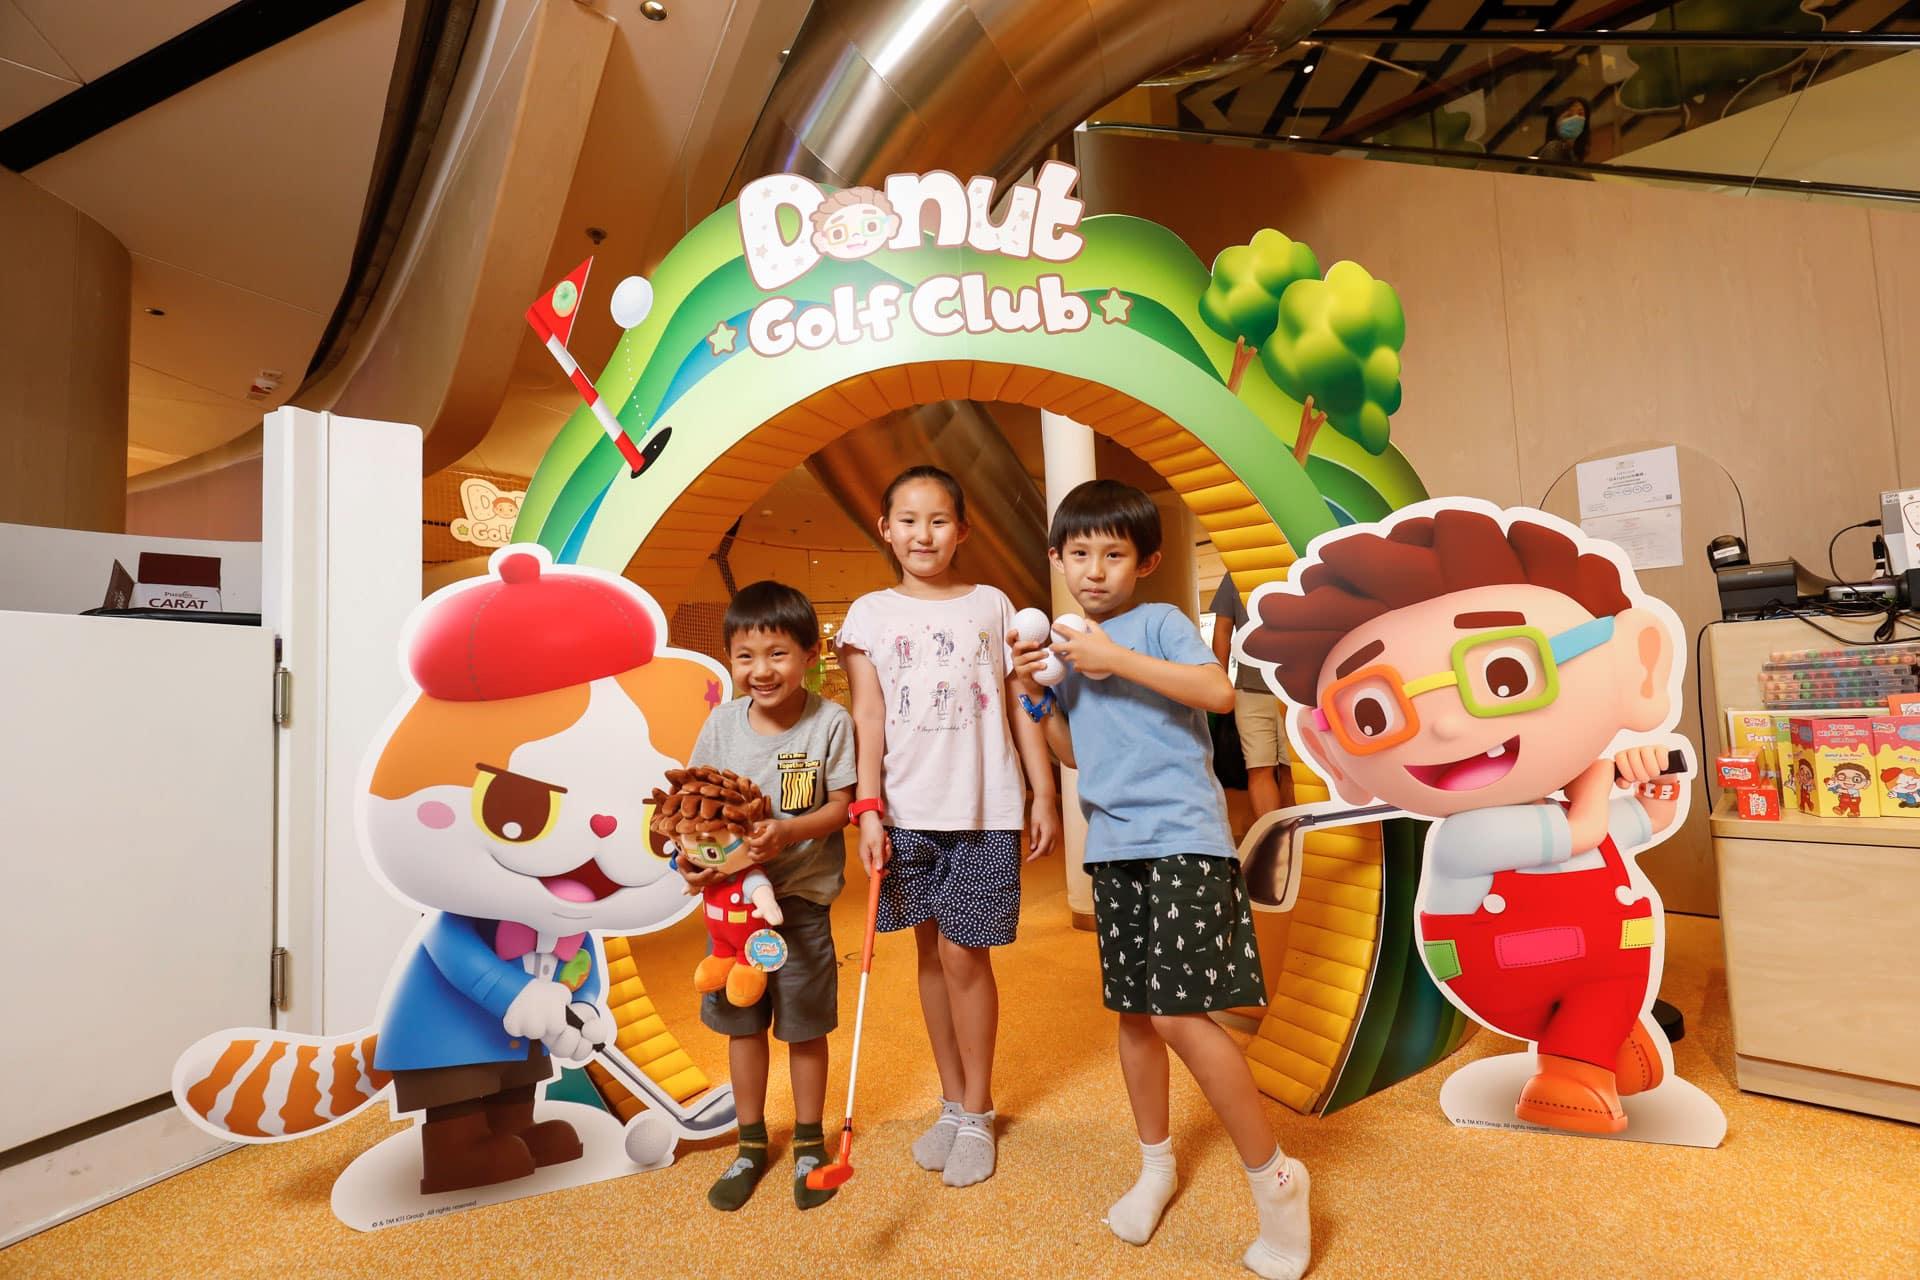 K11 MUSEA:Donut Playhouse夏日兒童嘉年華 全新遊戲 Donut Golf Club